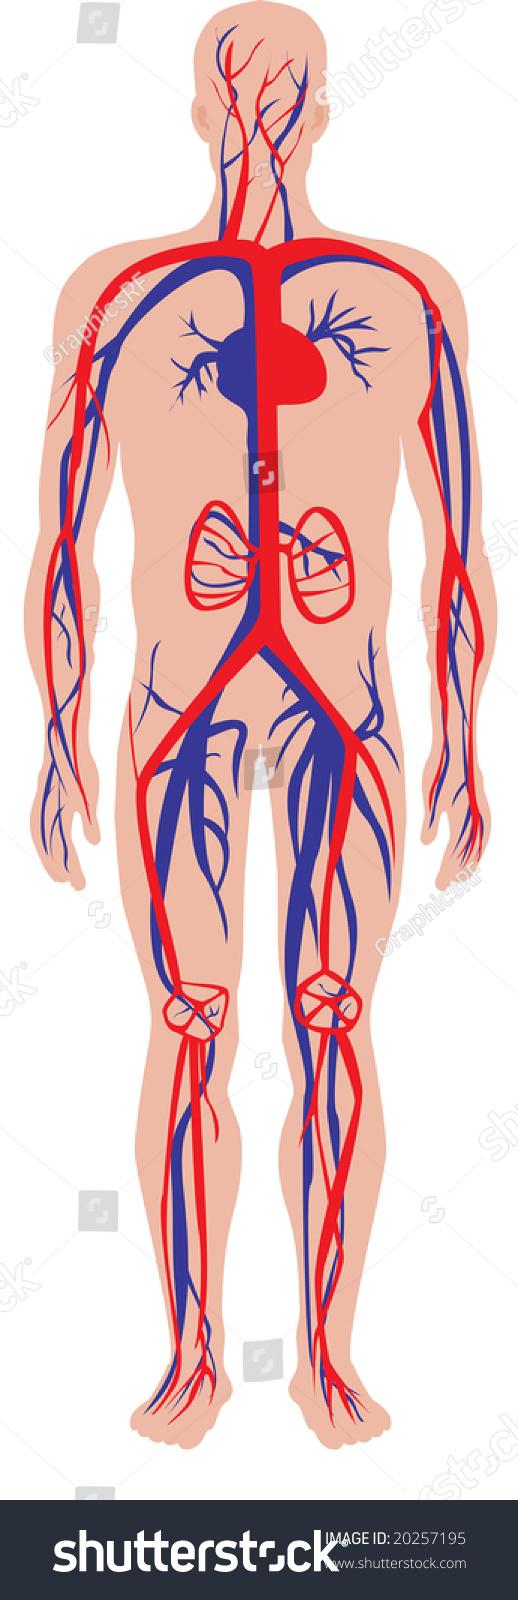 Illustration Human Circulatory Cardiovascular System Stock